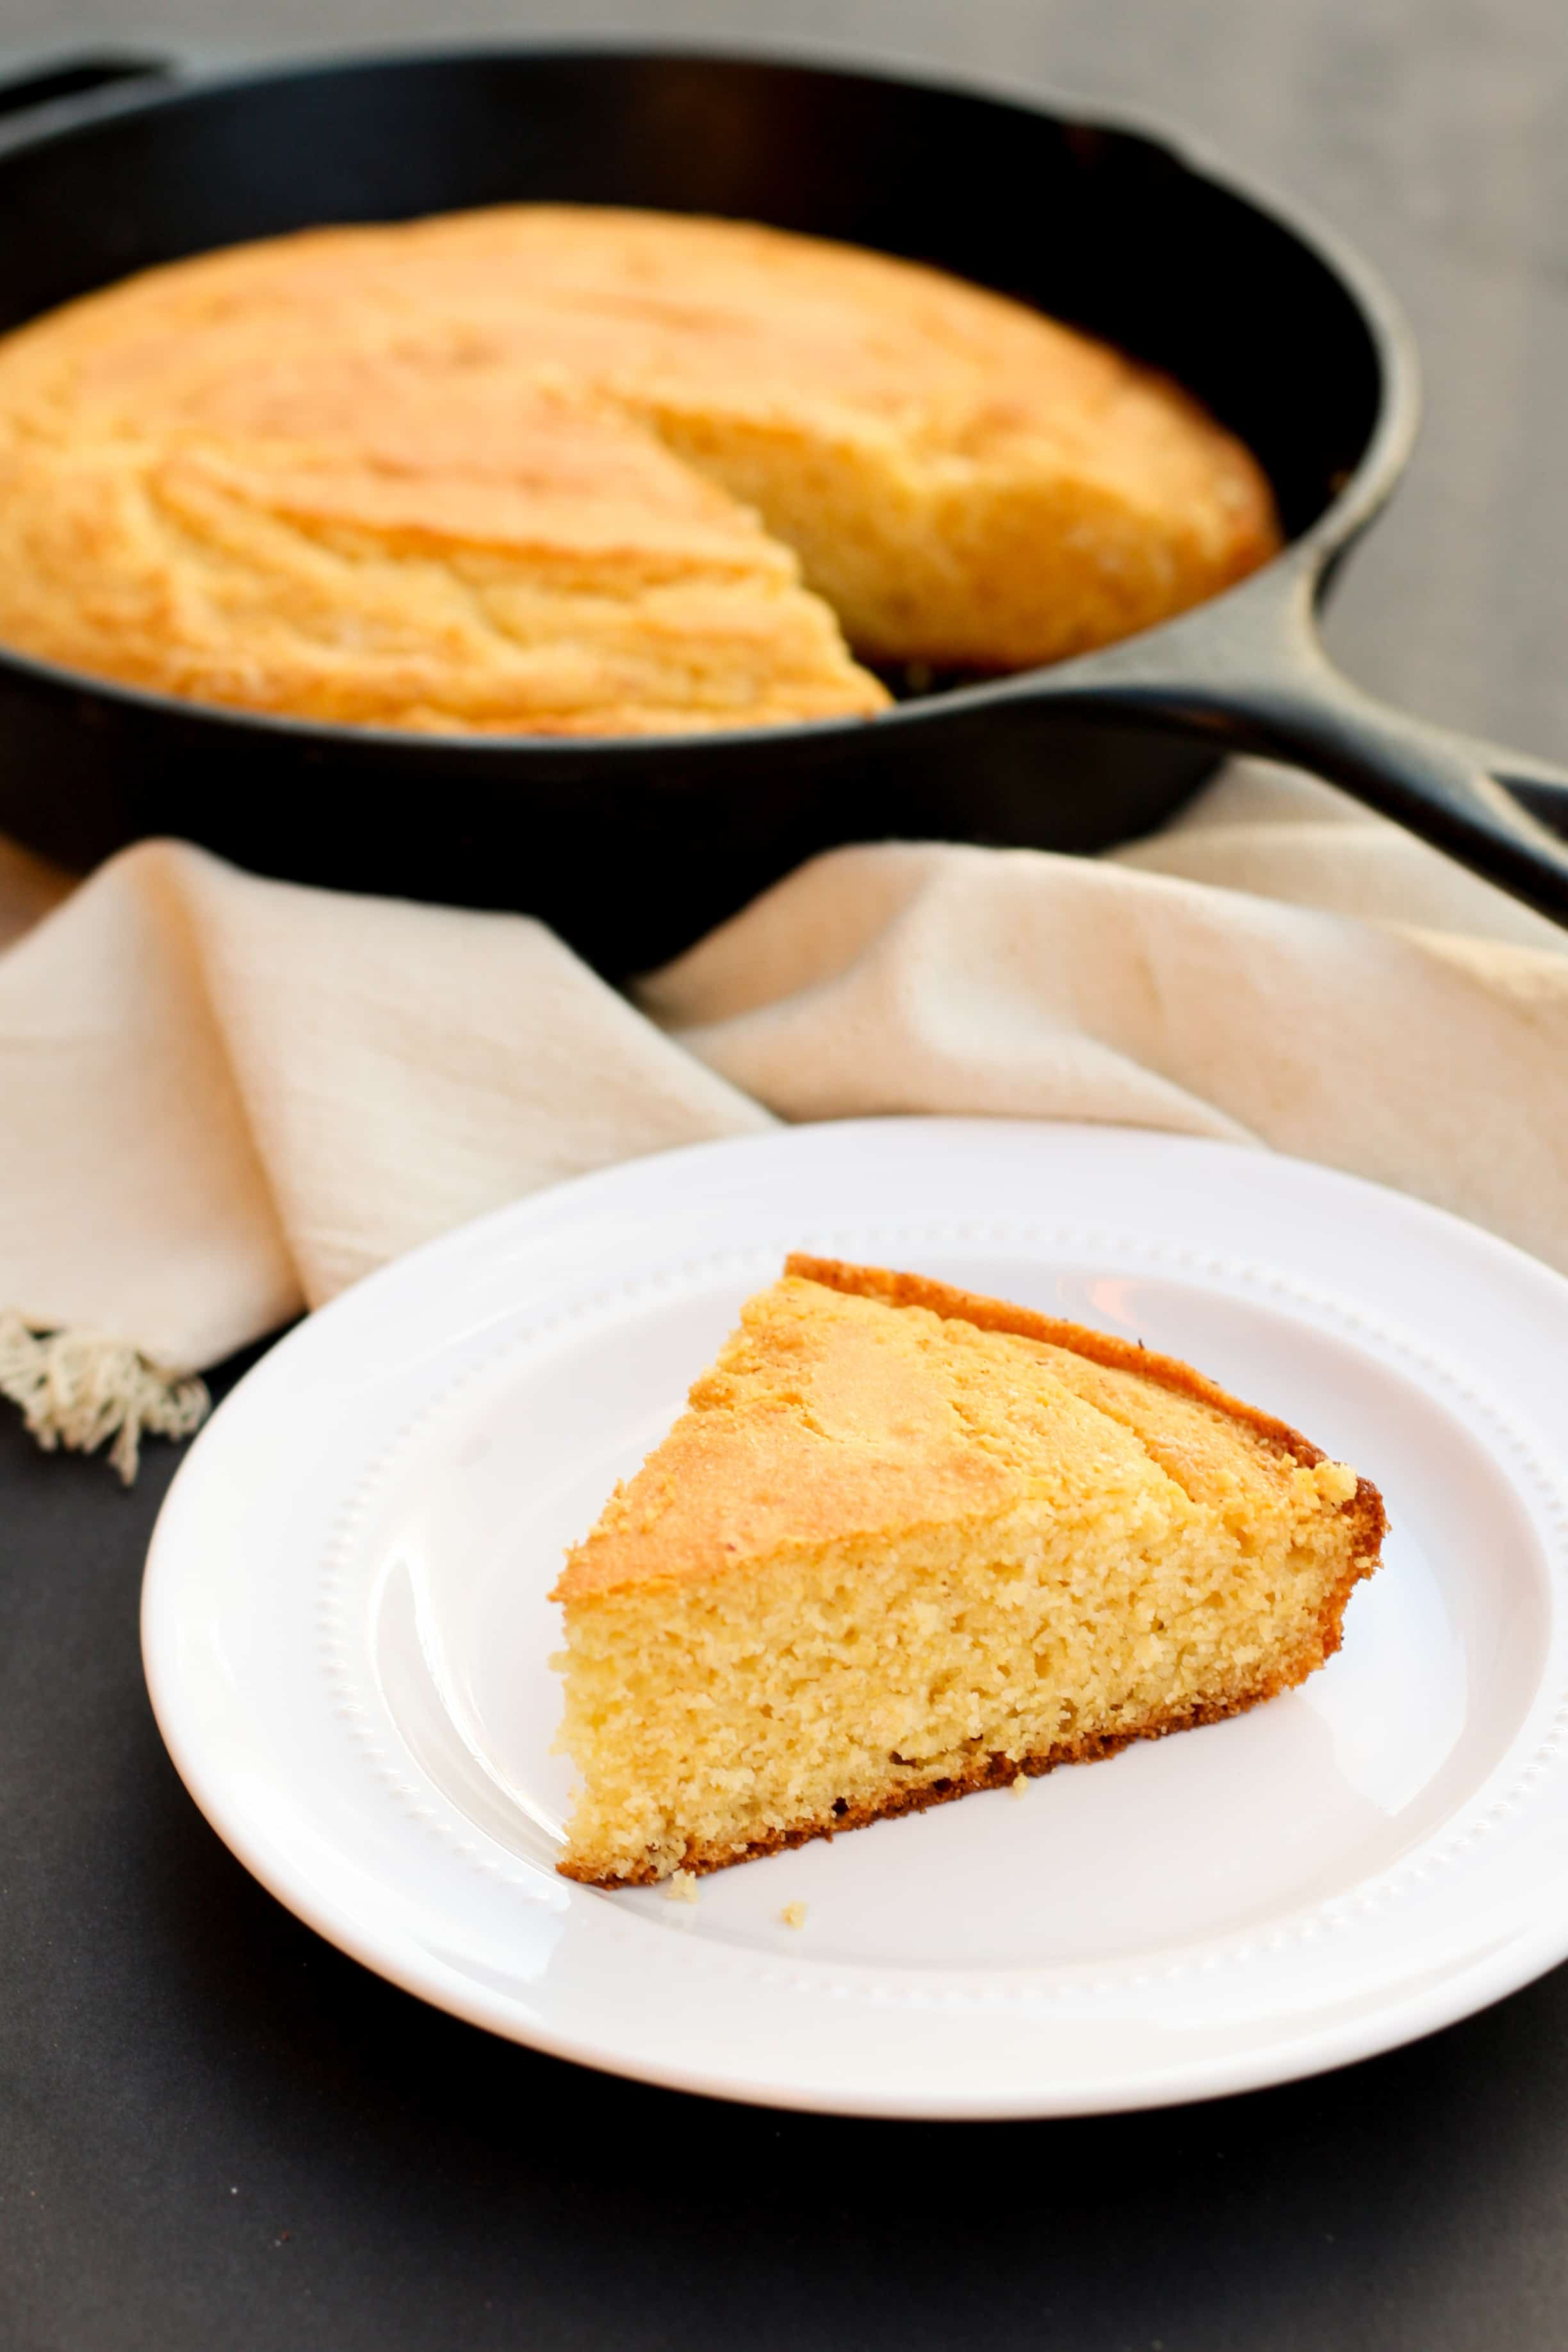 Cornbread Gluten Free  Top 15 Gluten Free Recipes of 2015